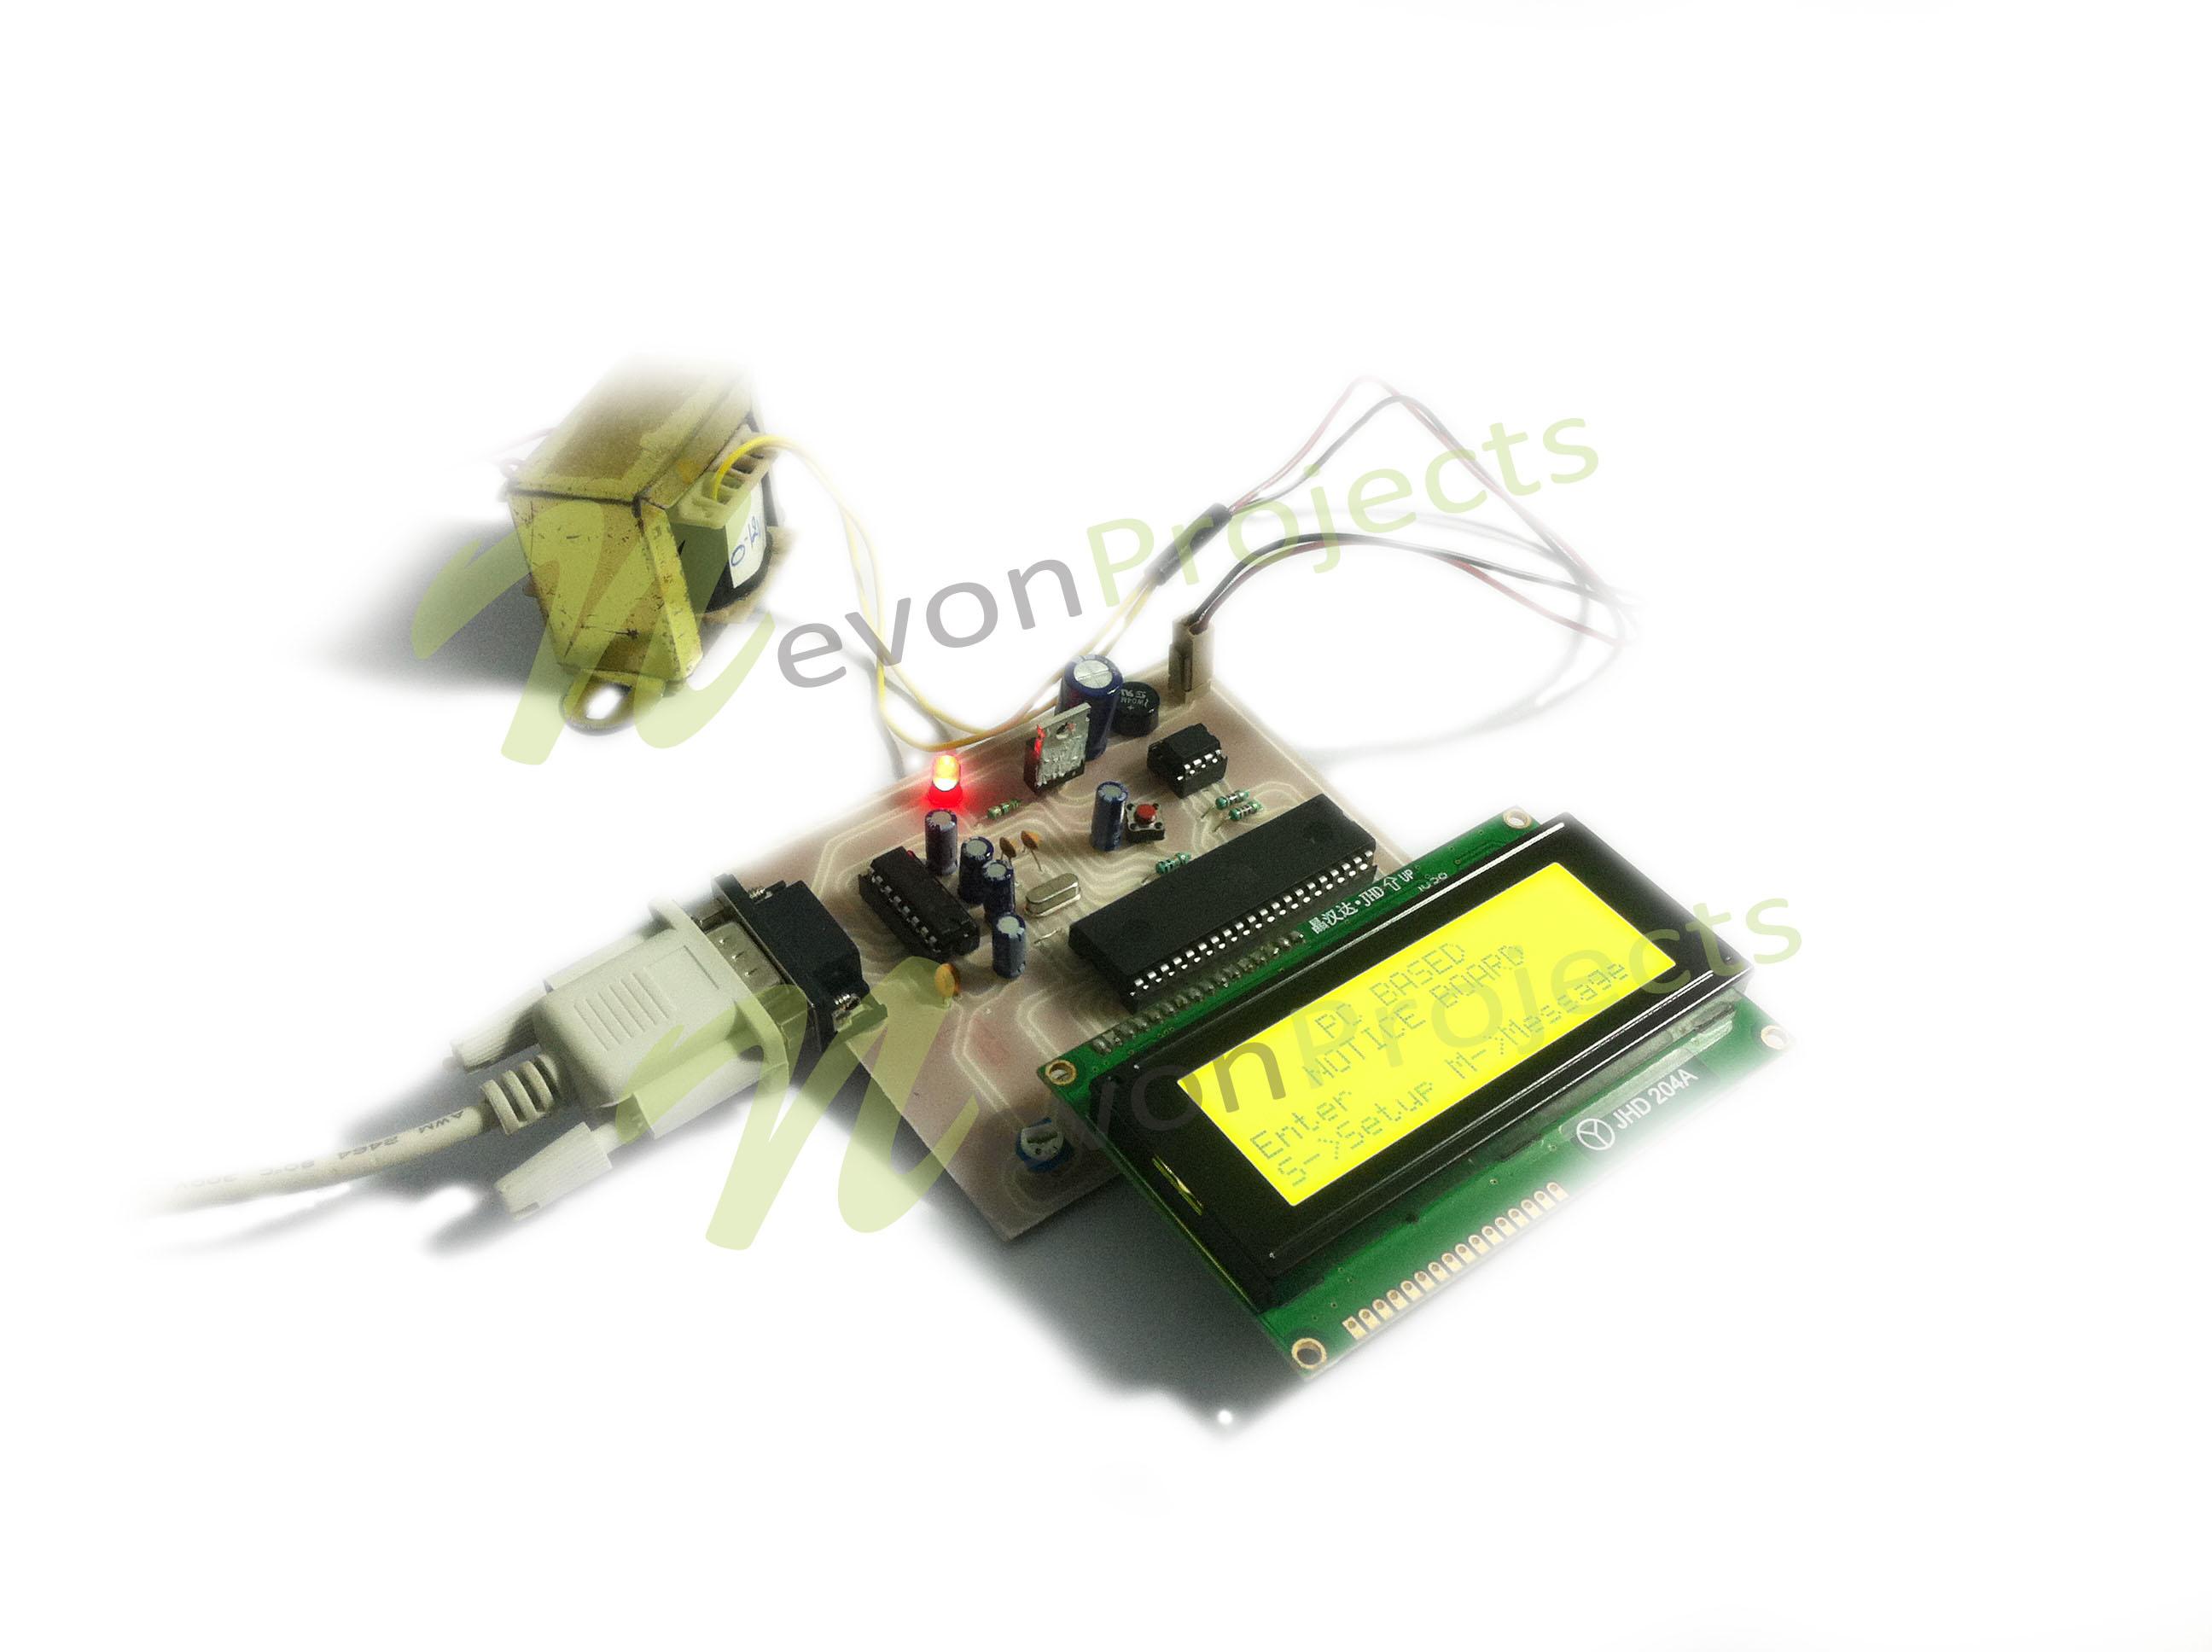 Microcontroller Based Schematics 8051 Development System Circuit Board